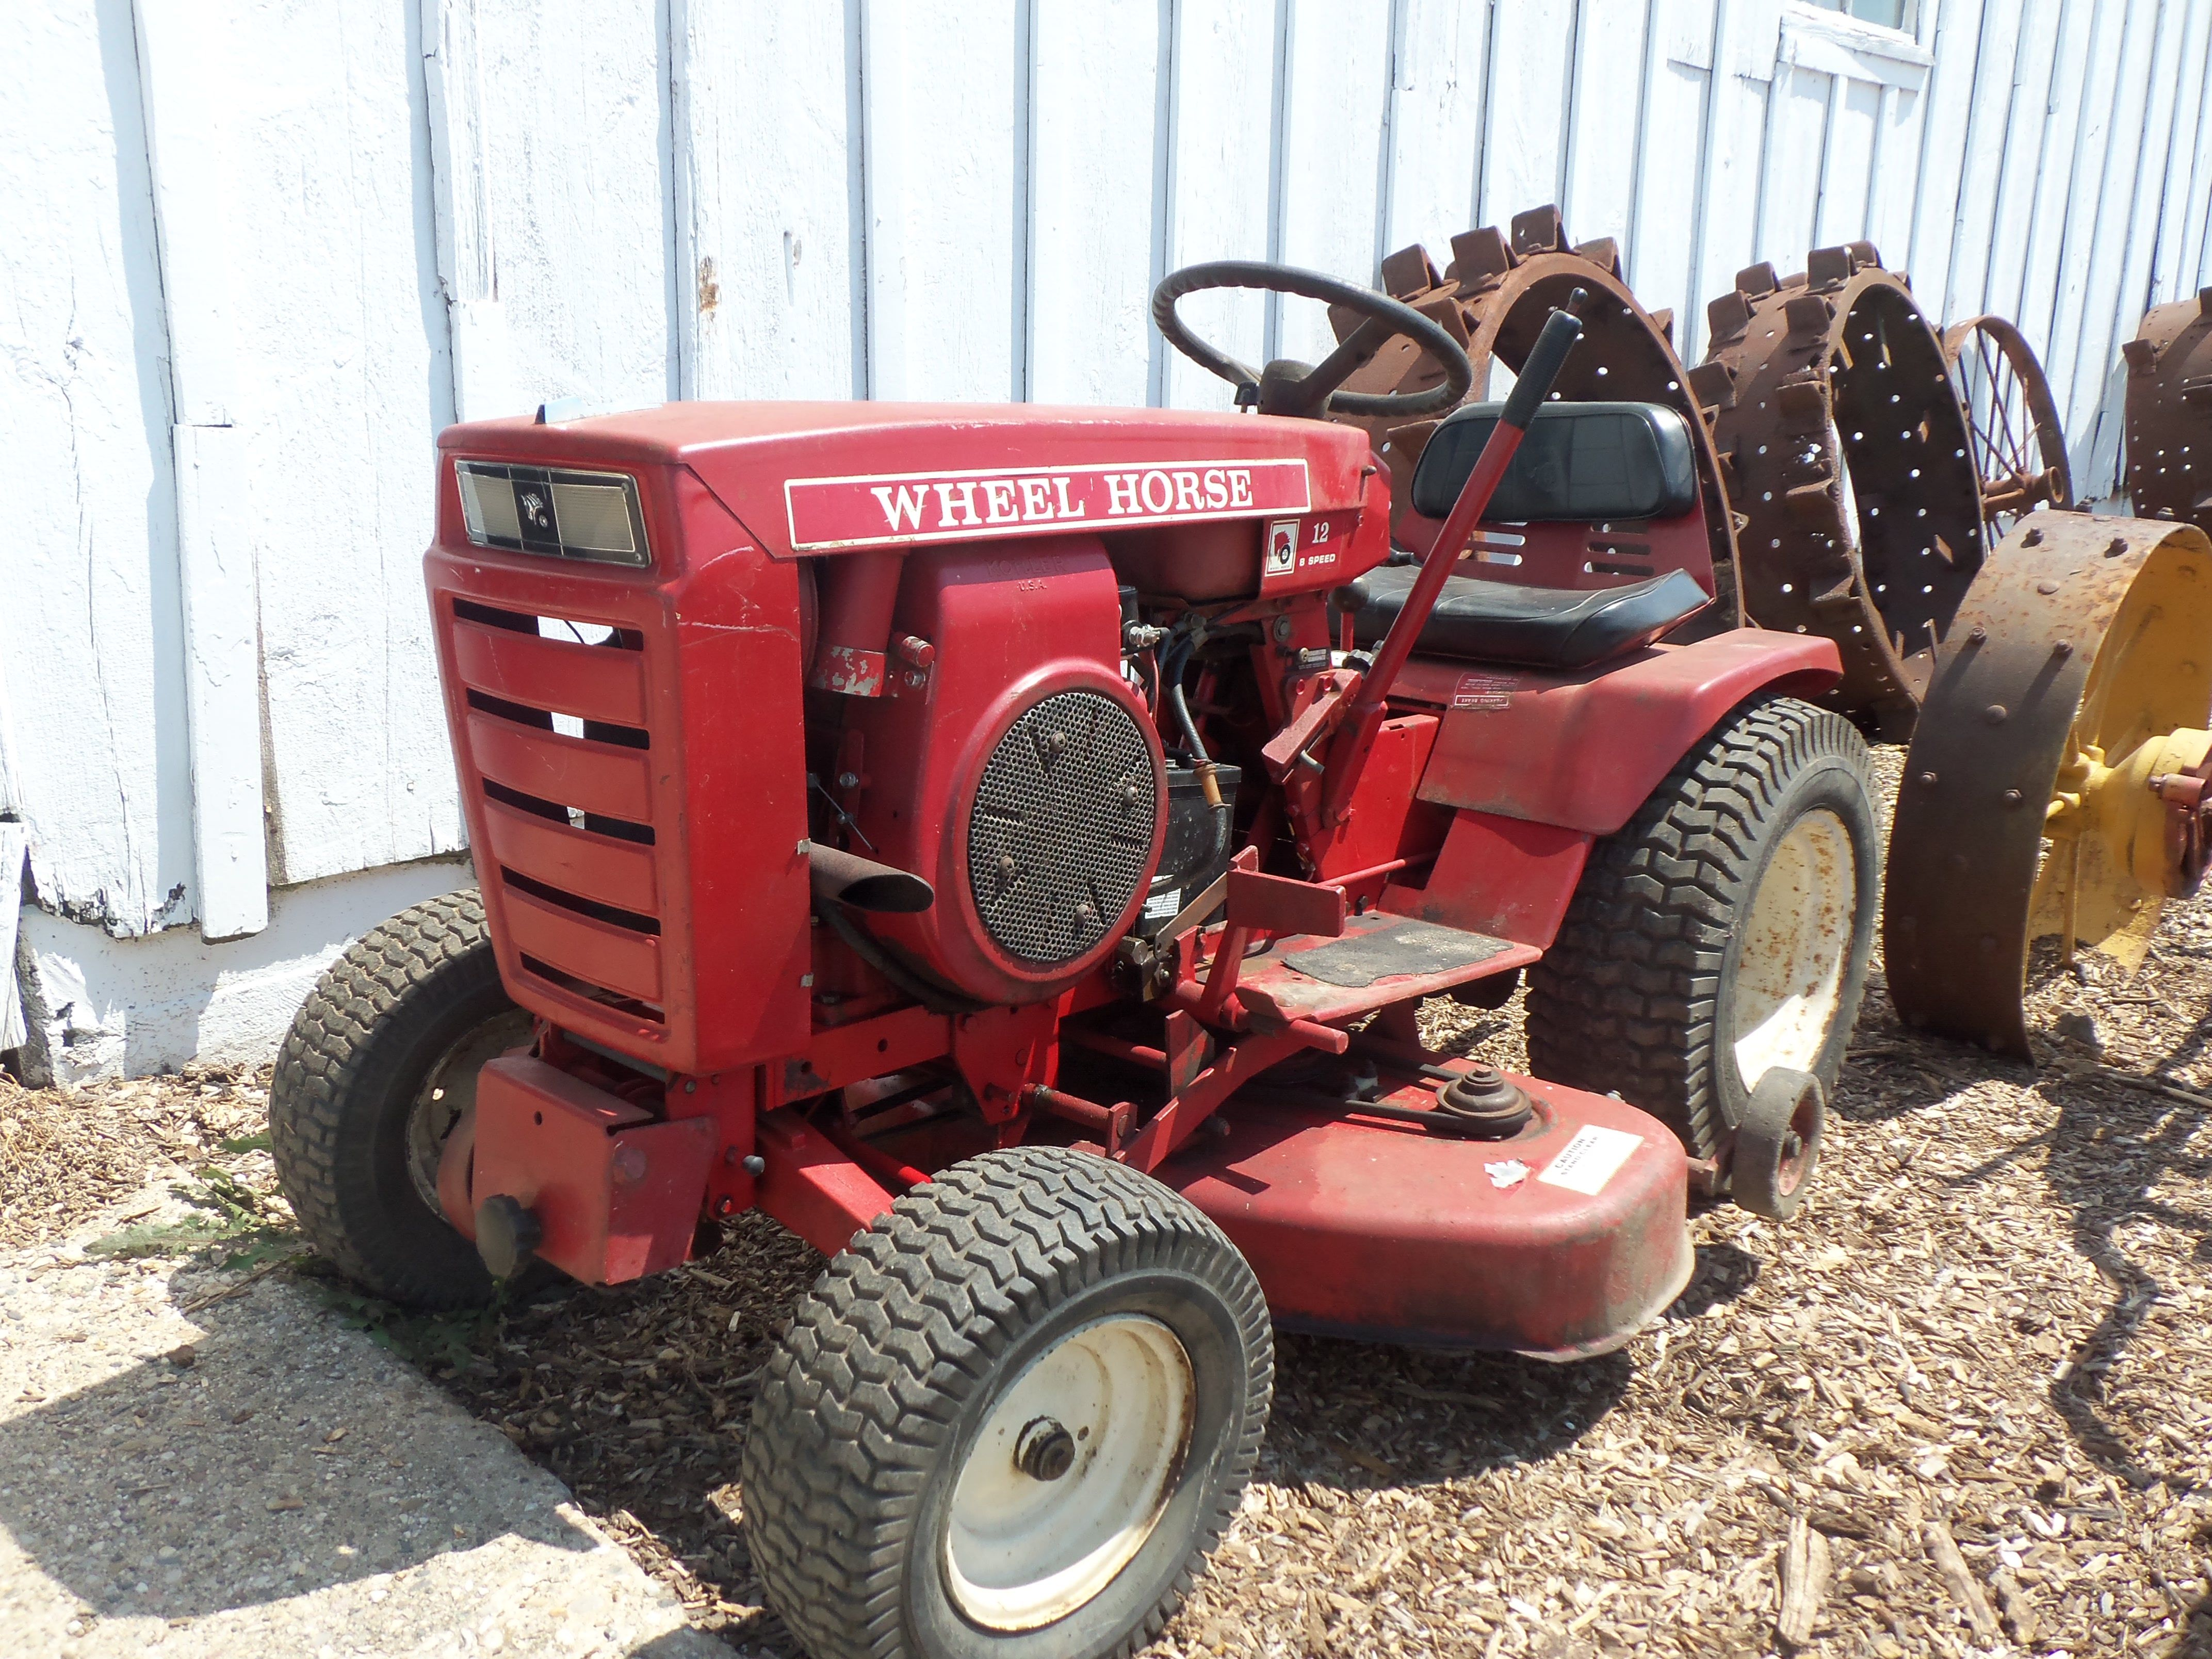 10 20hp wheel horse garden tractor farm equipment pinterest rh pinterest com Wheel Horse Tractor Belts Wheel Horse Tractor Models